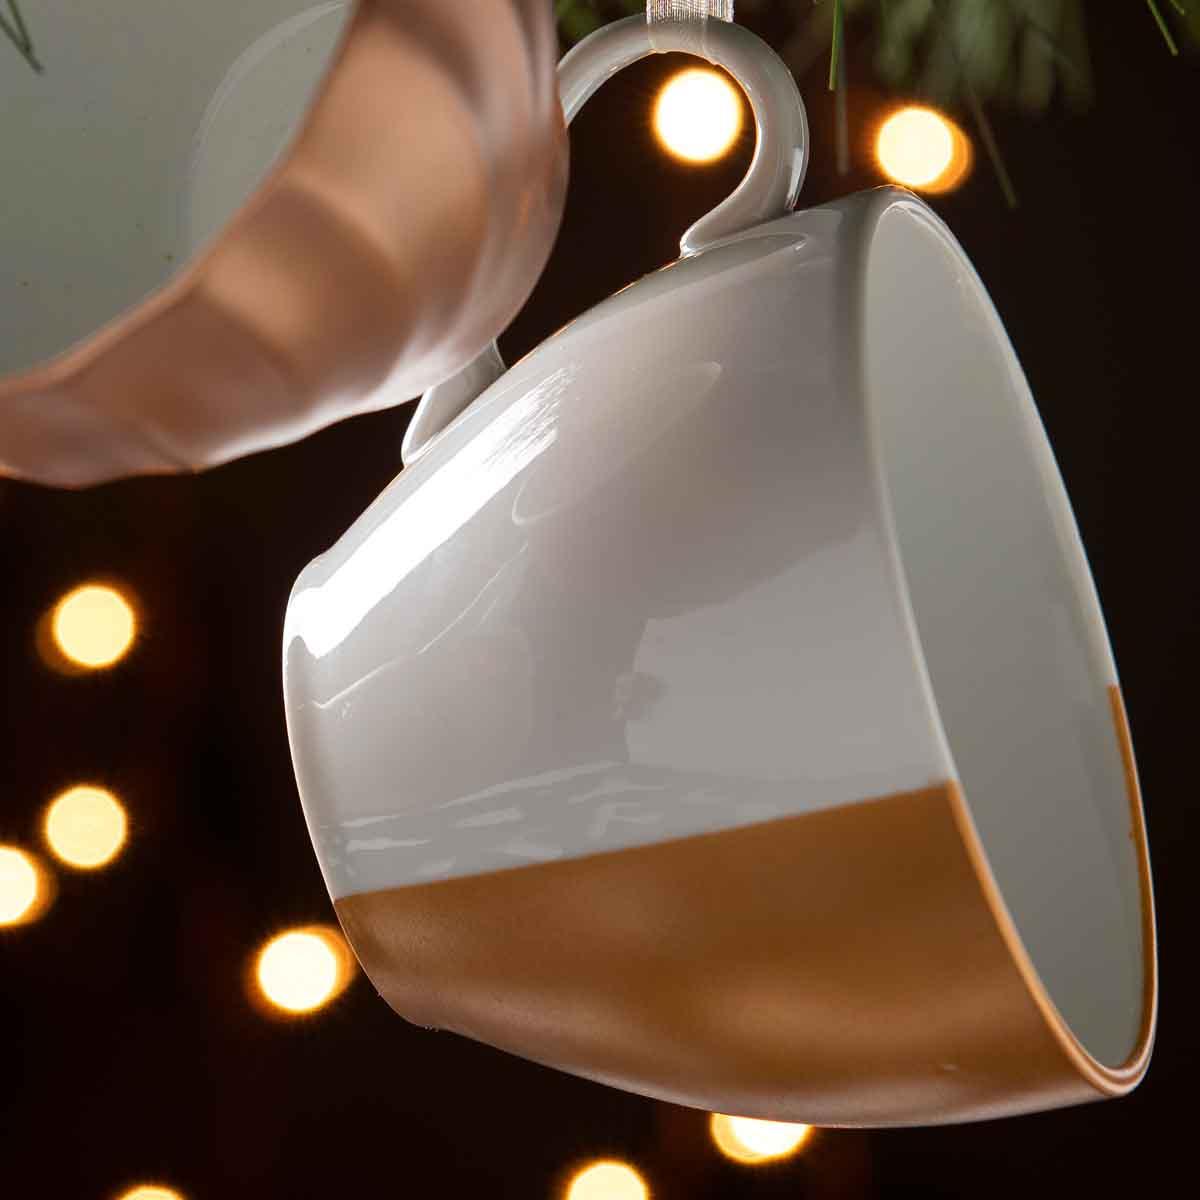 Metallic Teacup Ornaments